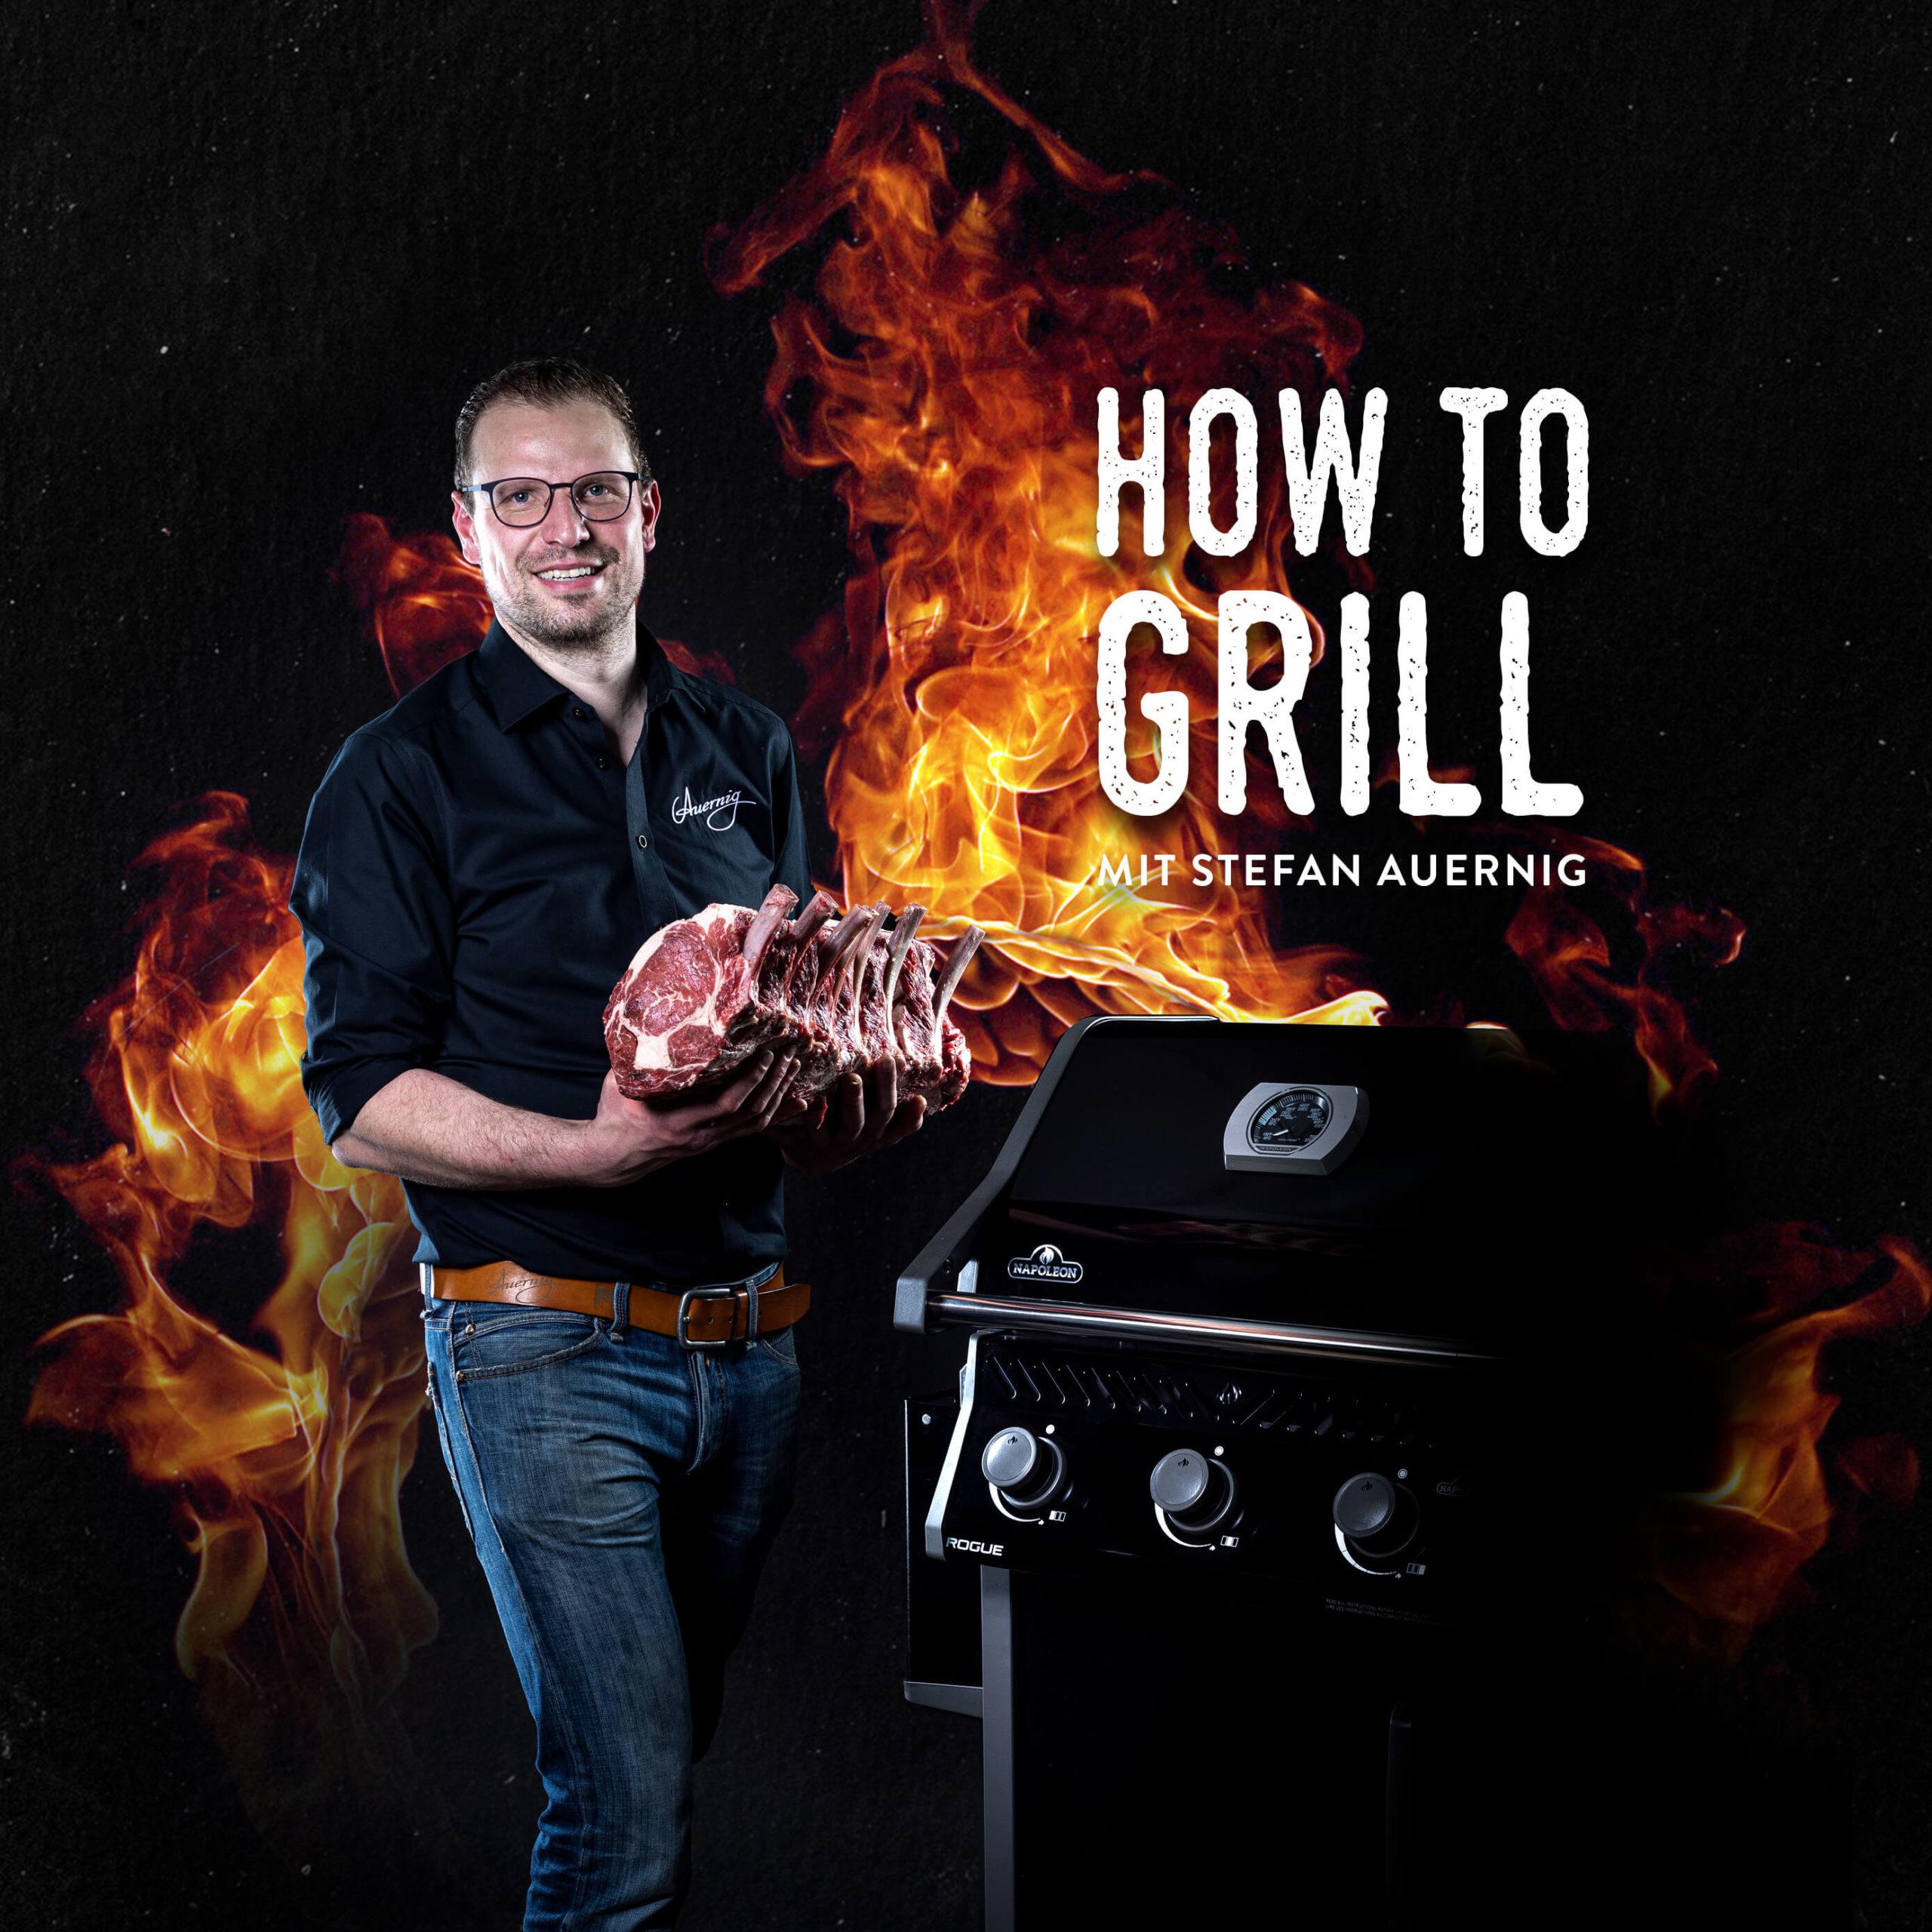 How to Grill mit Stefan Auernig